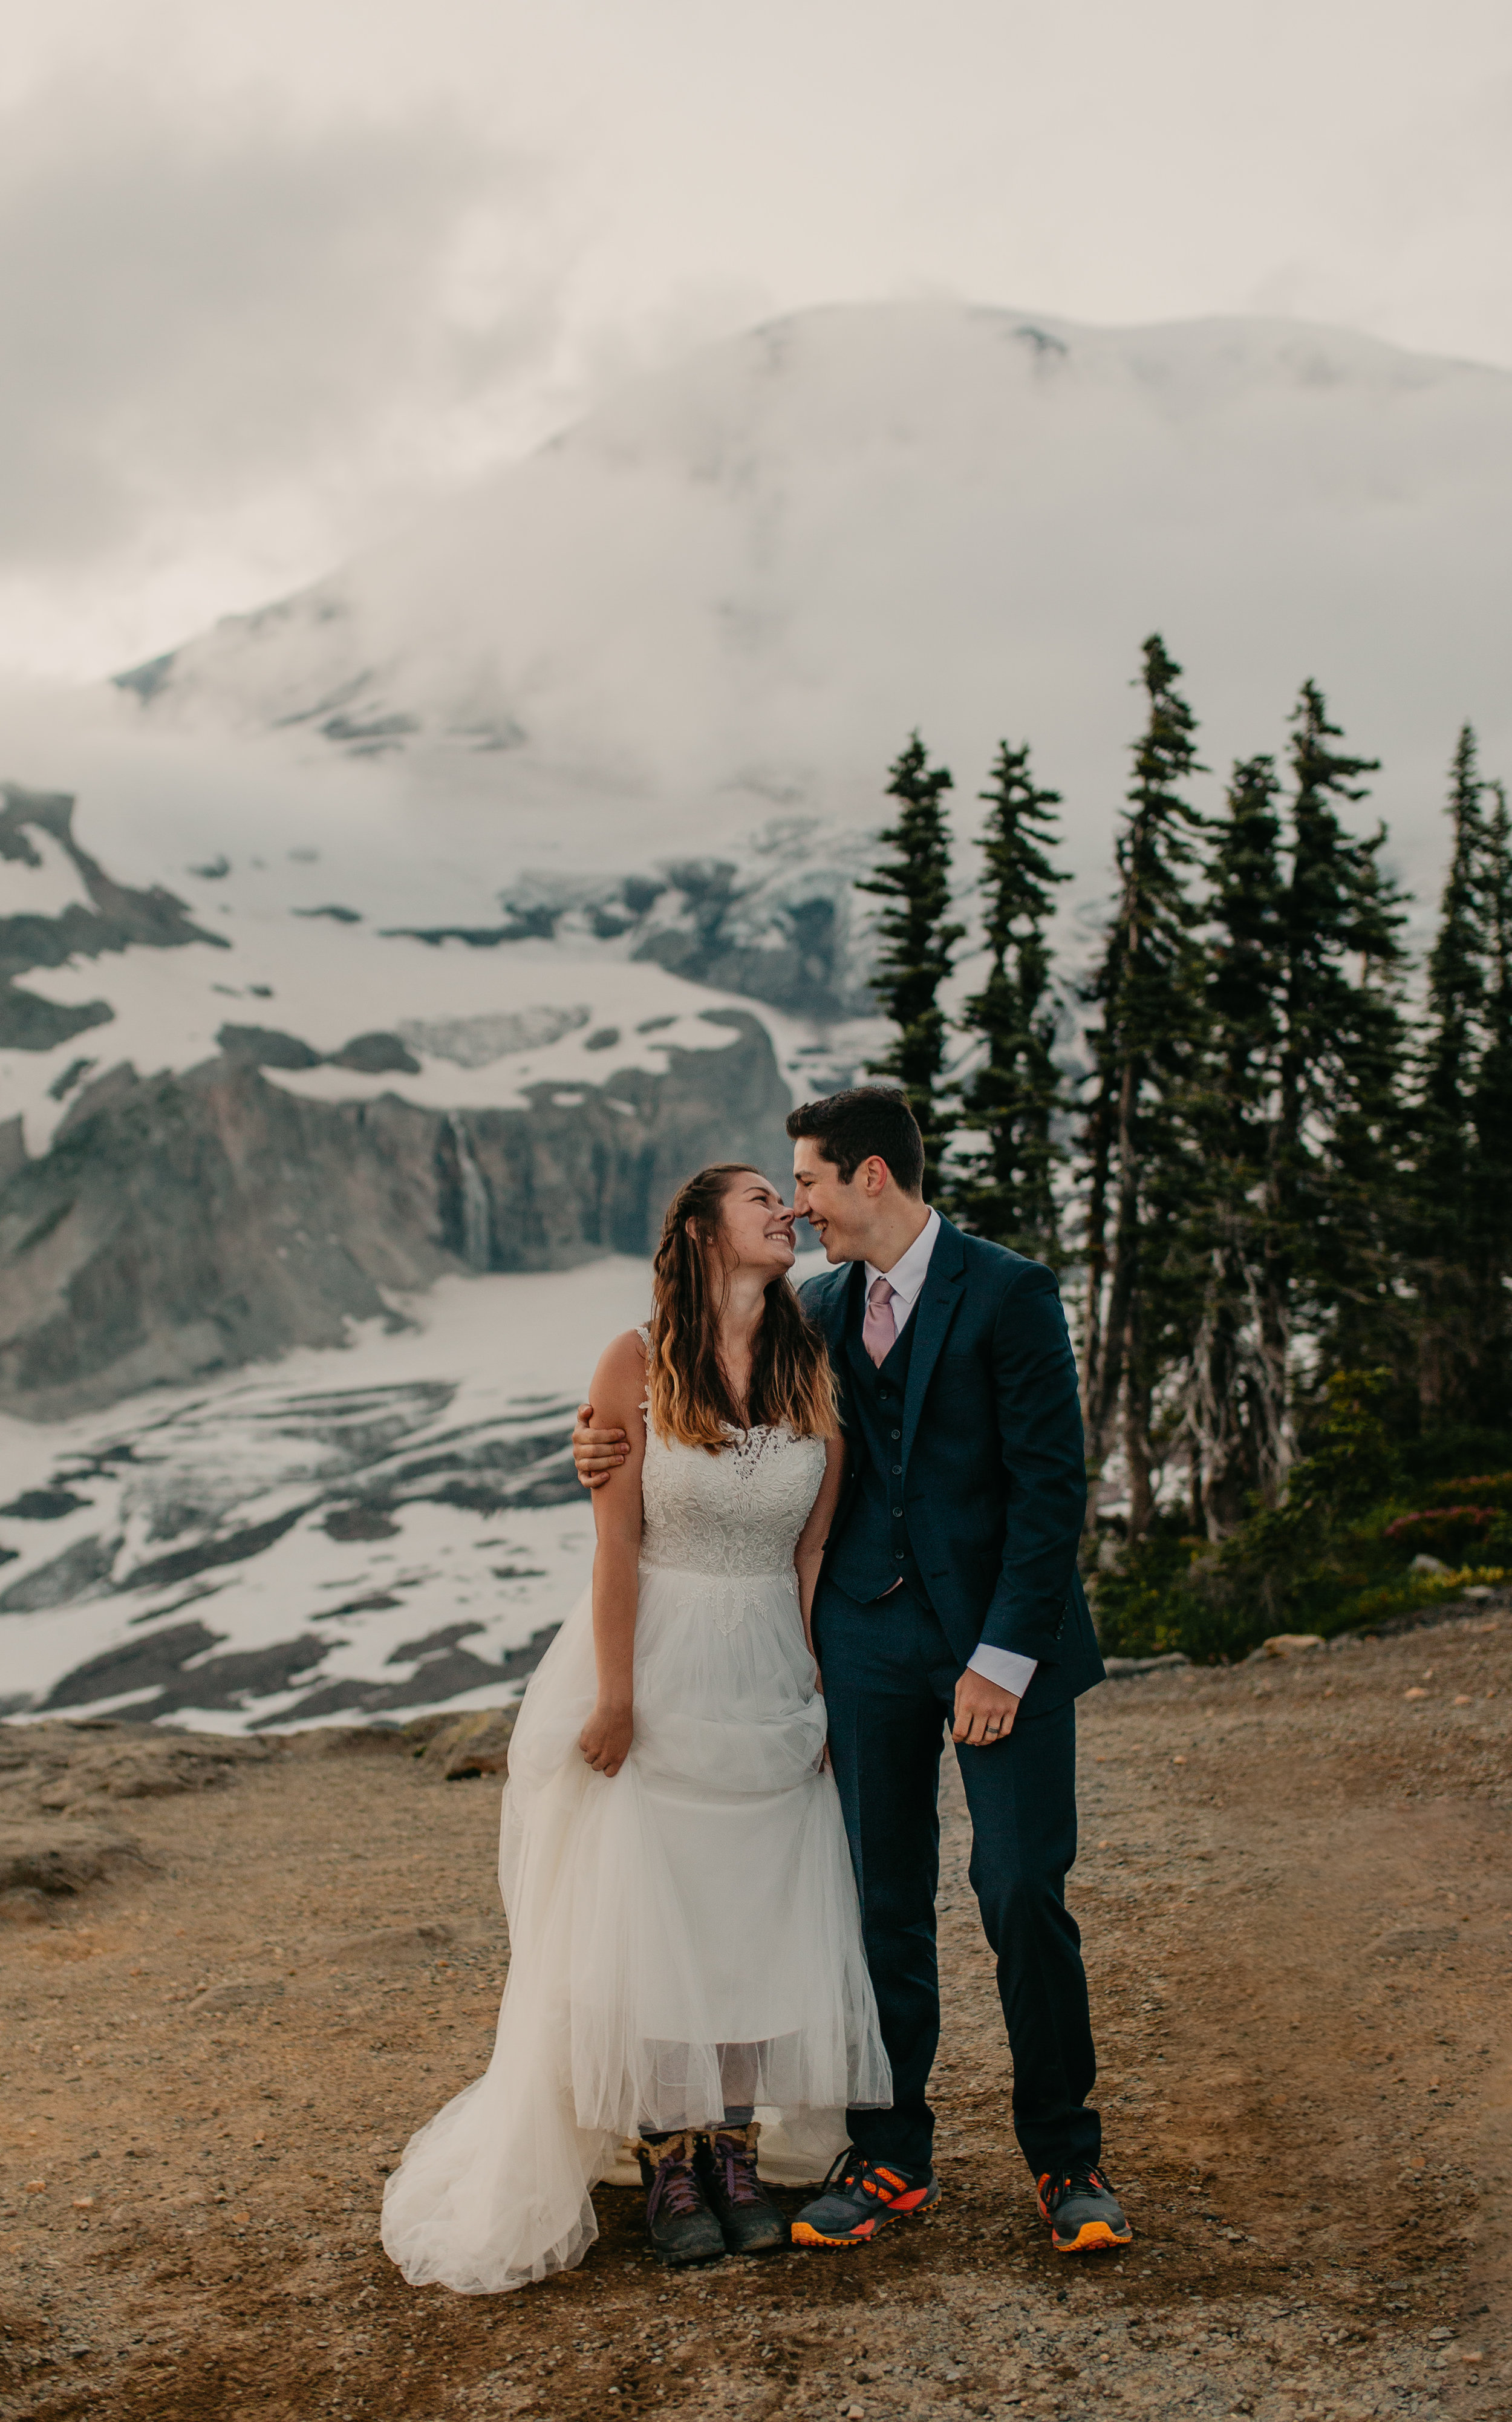 Nicole-Daacke-Photography-Mt-Rainier-elopement-photographer-washington-mountain-epic-wedding-photography-wildflowers-at-rainier-pine-tree-cloudy-summer-day-at-mountain-rainier-69.jpg